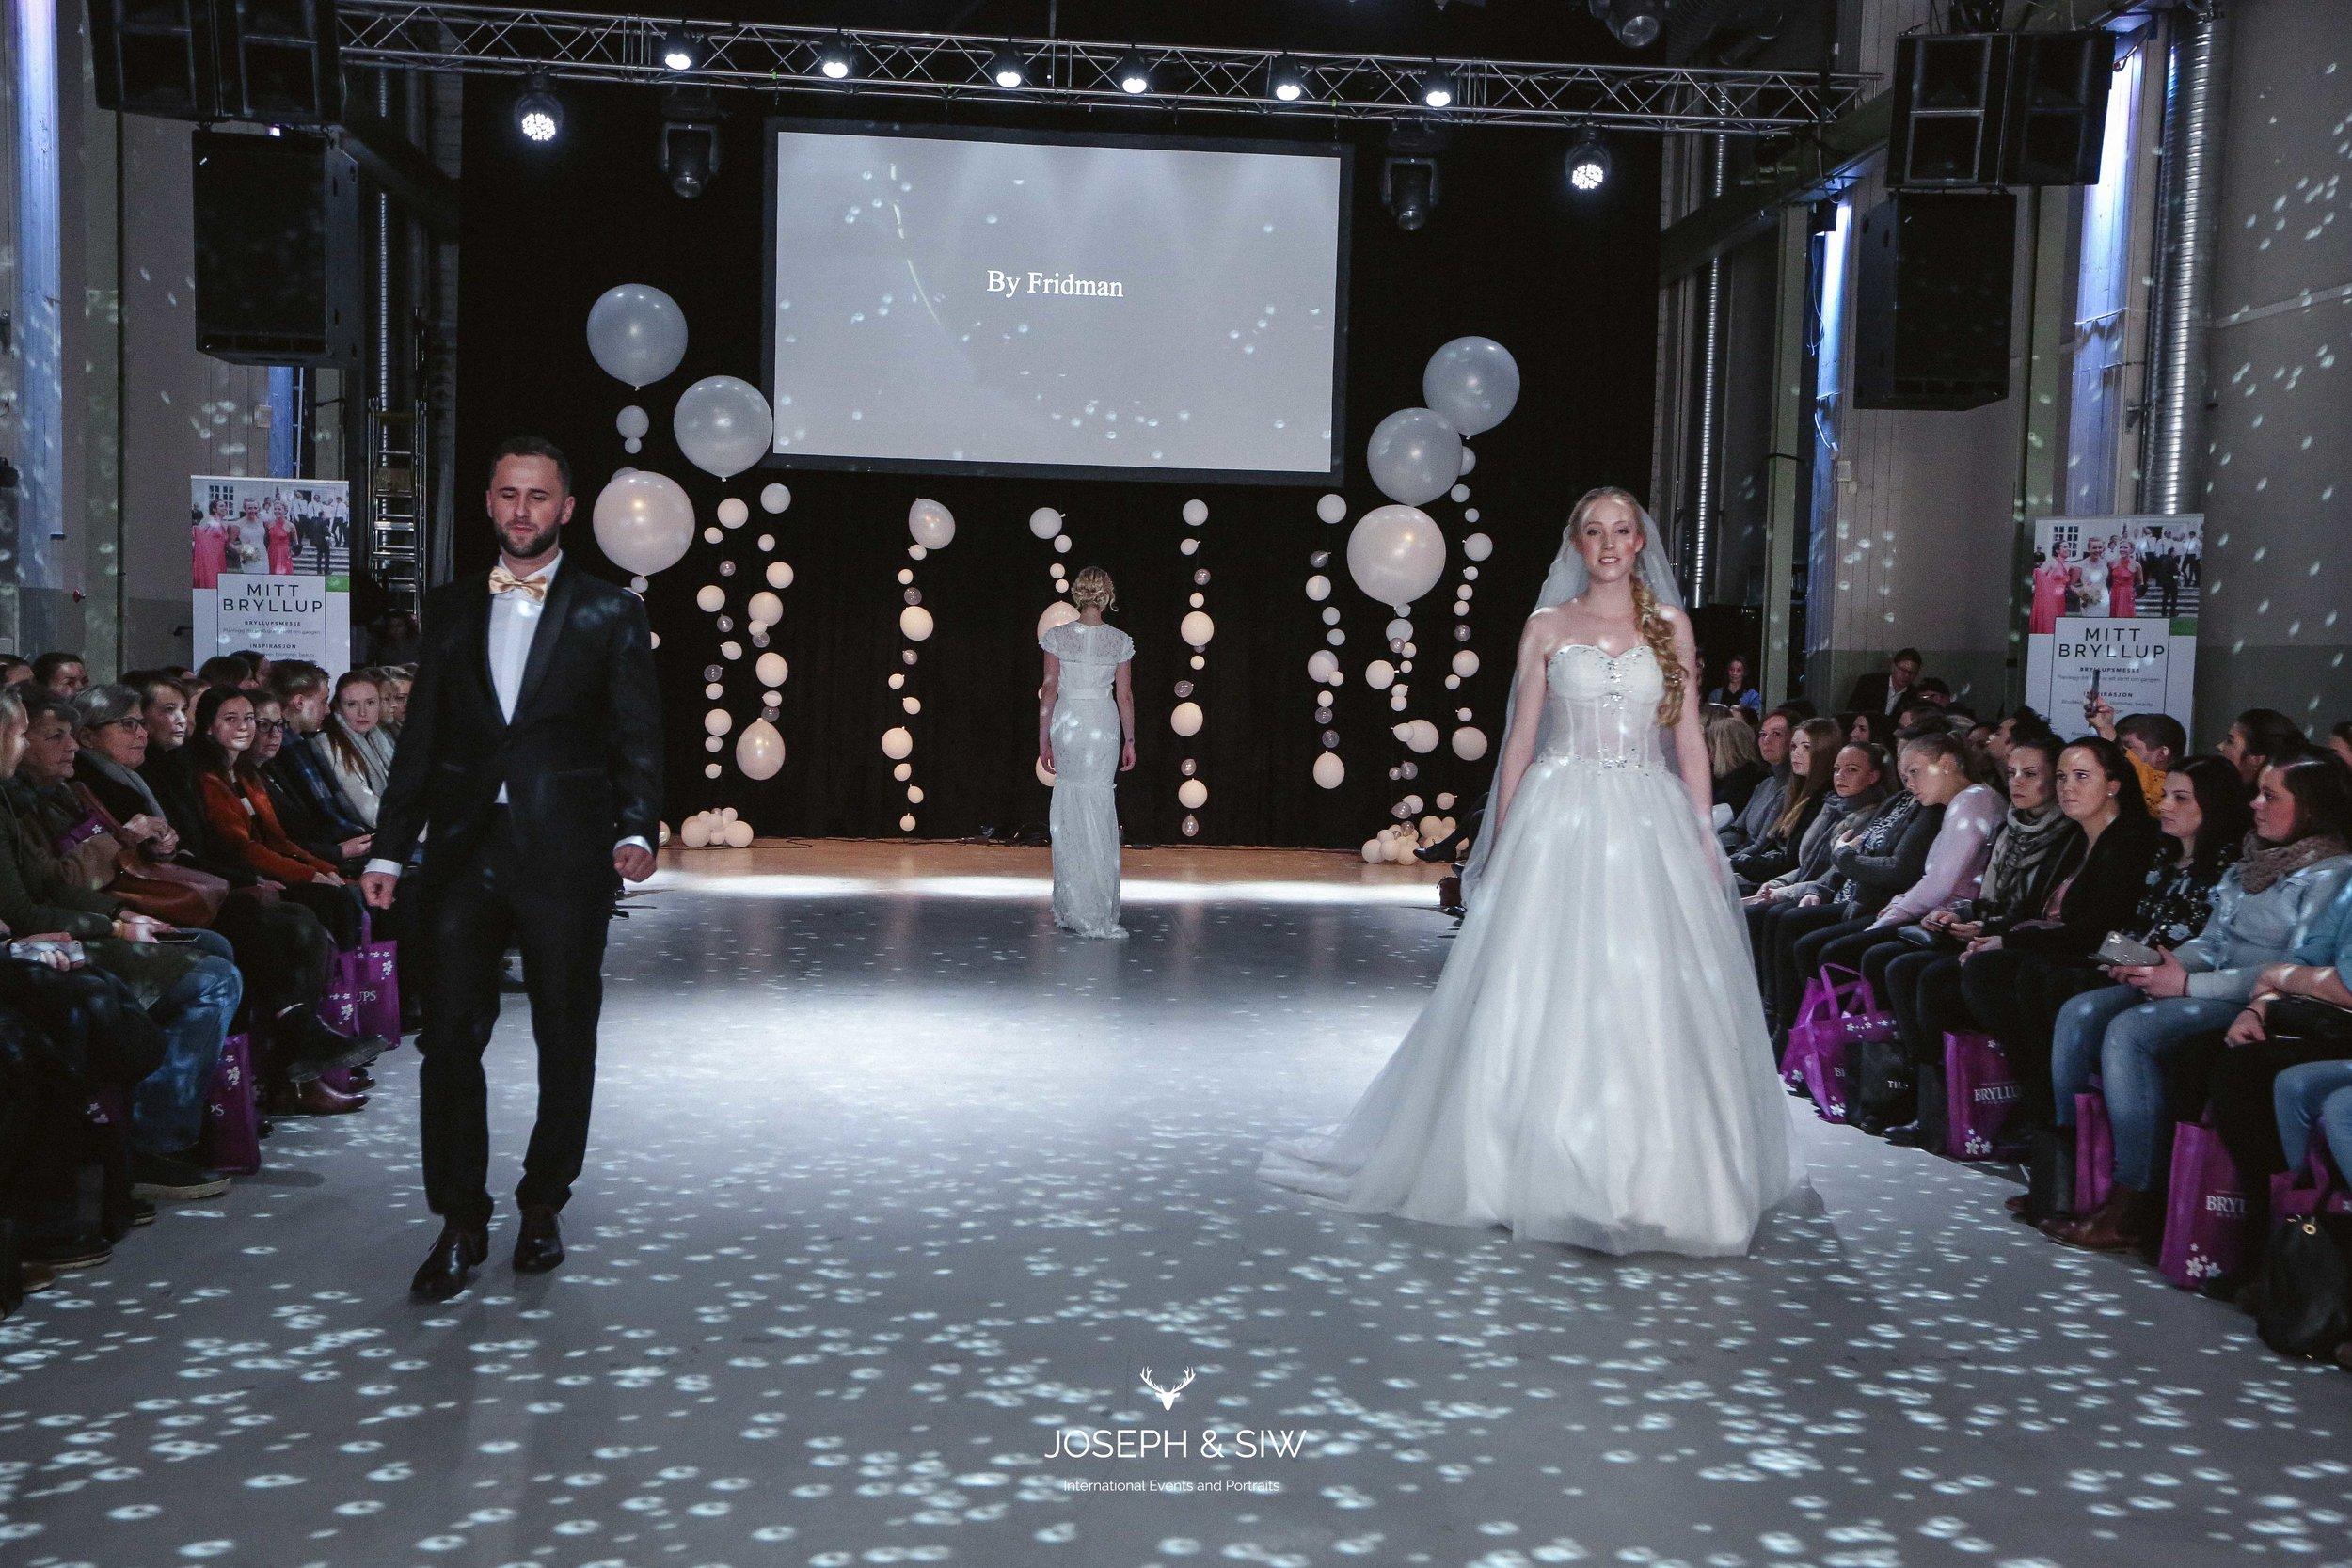 mittbryllup_bryllupsmesse_i_oslo_116.jpg